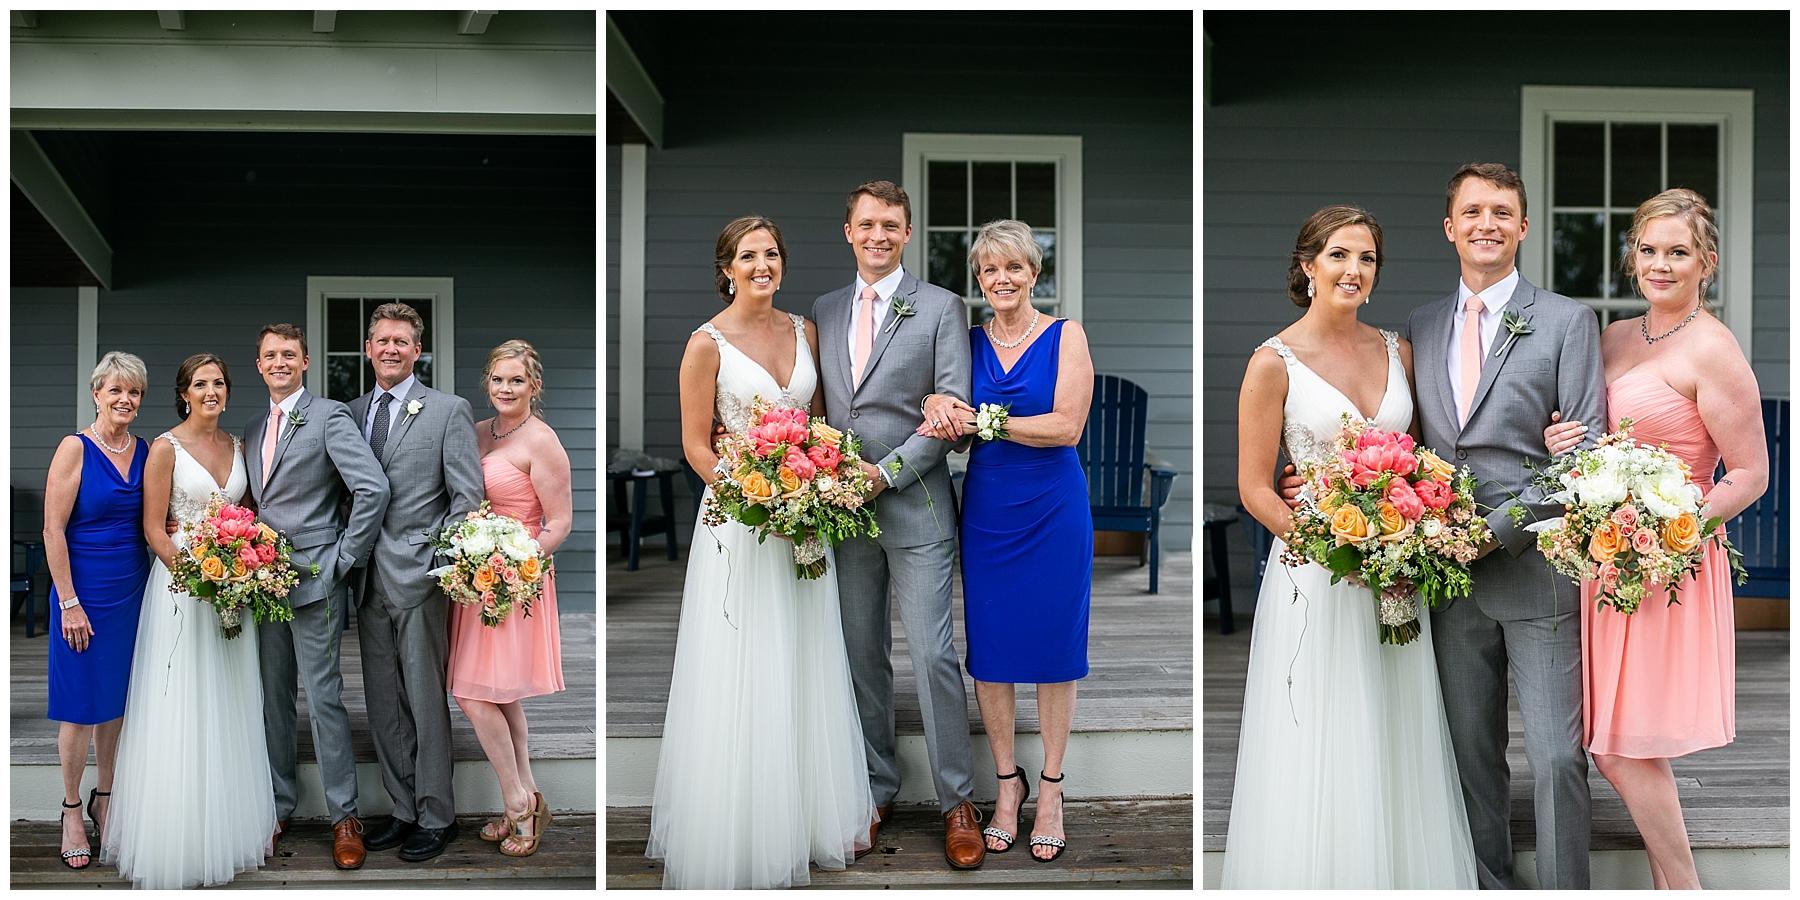 Chelsea Phil Bohemia River Overlook Wedding Living Radiant Photography photos_0084.jpg